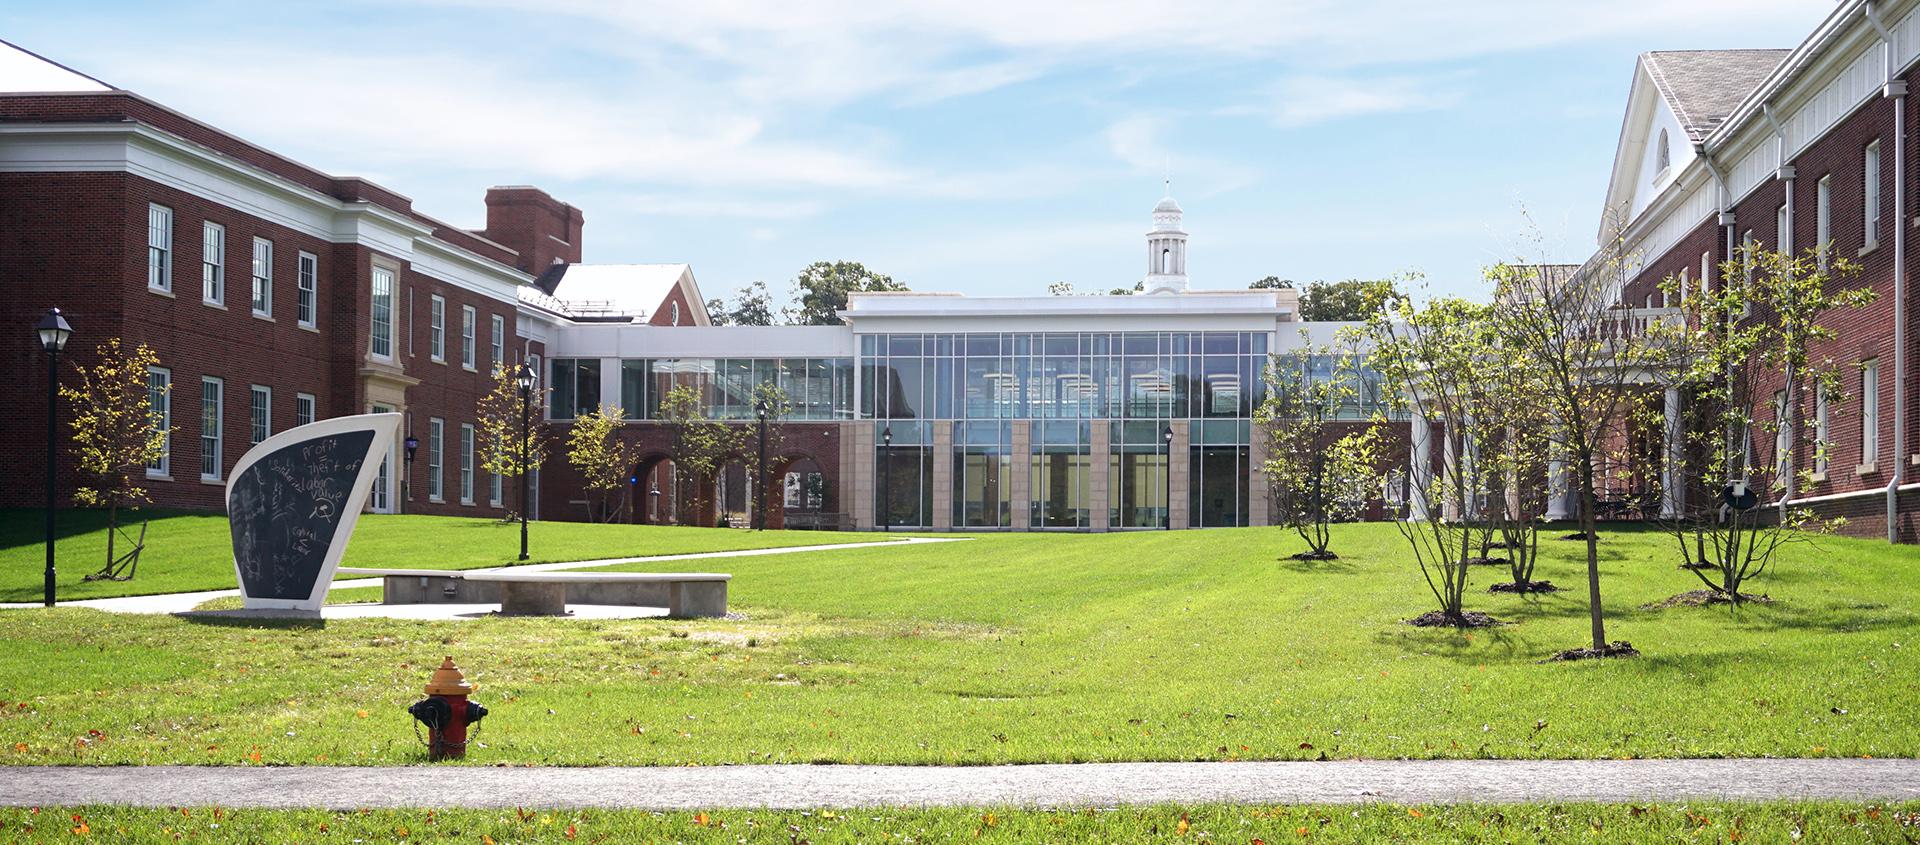 The College of NJ Stem Complex